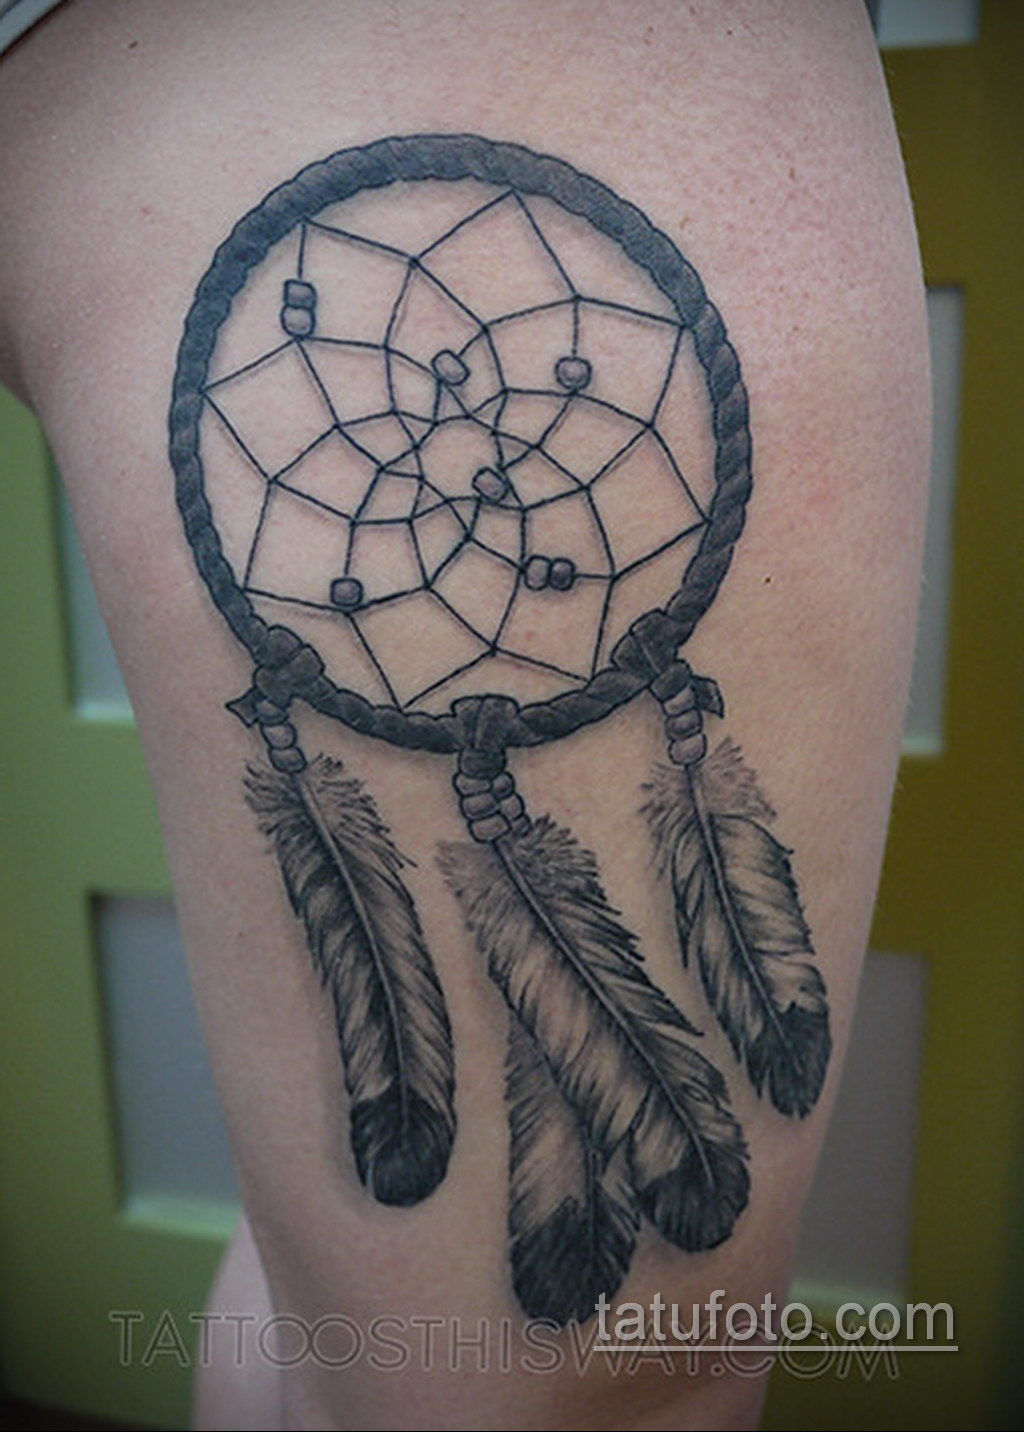 Фото рисунка тату с ловцом снов 22.11.2020 №413 -Dreamcatcher tattoo- tatufoto.com